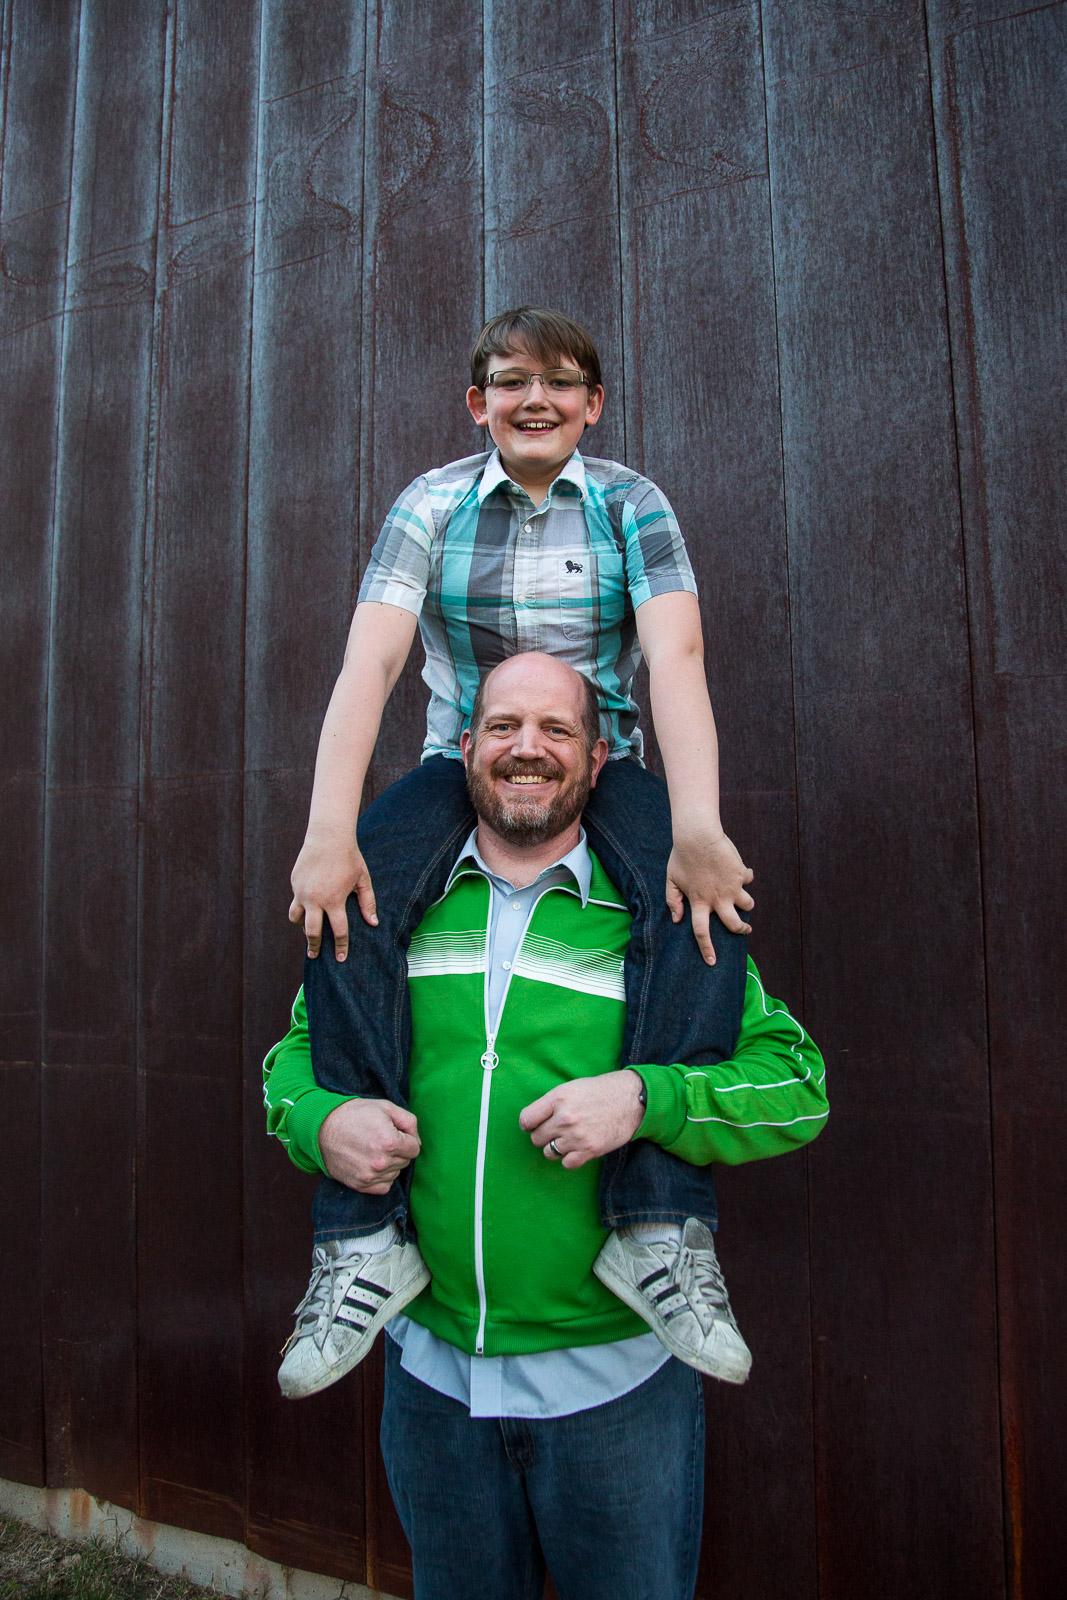 las-vegas-family-portrait-photography-4474.jpg